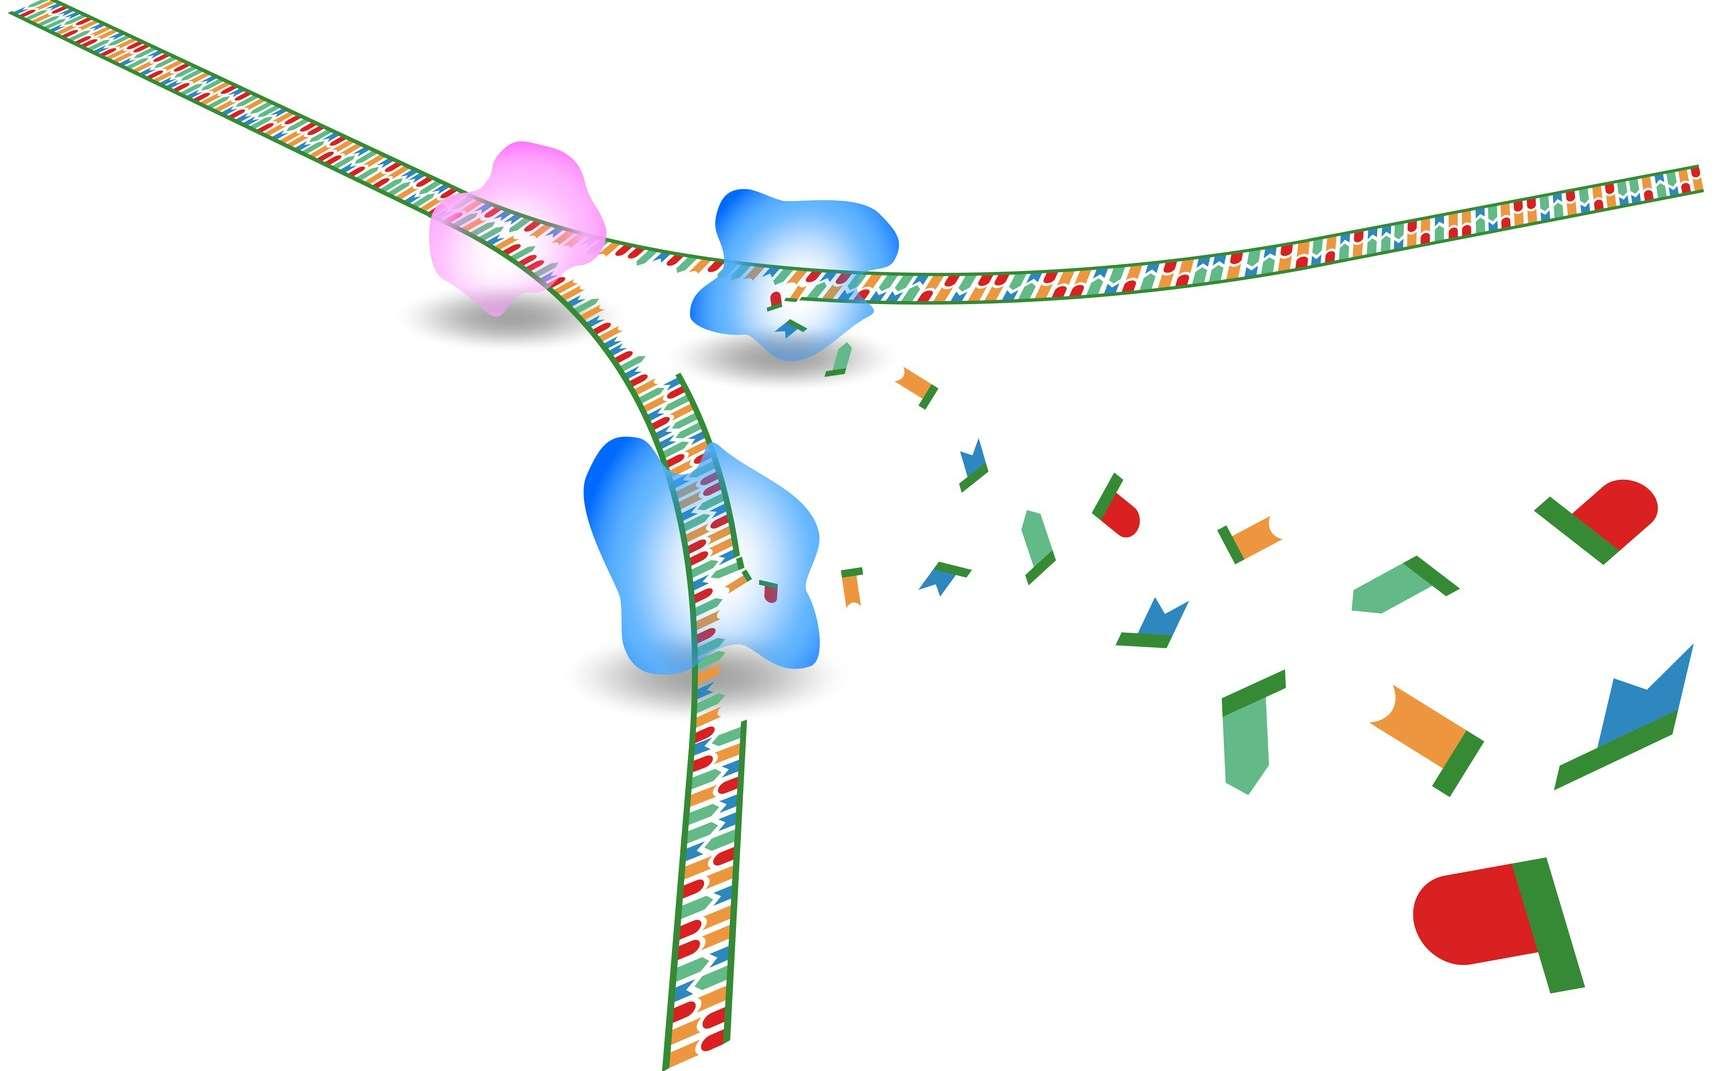 L'ADN polymérase est l'enzyme qui catalyse la réplication de l'ADN. © deusin, Fotolia